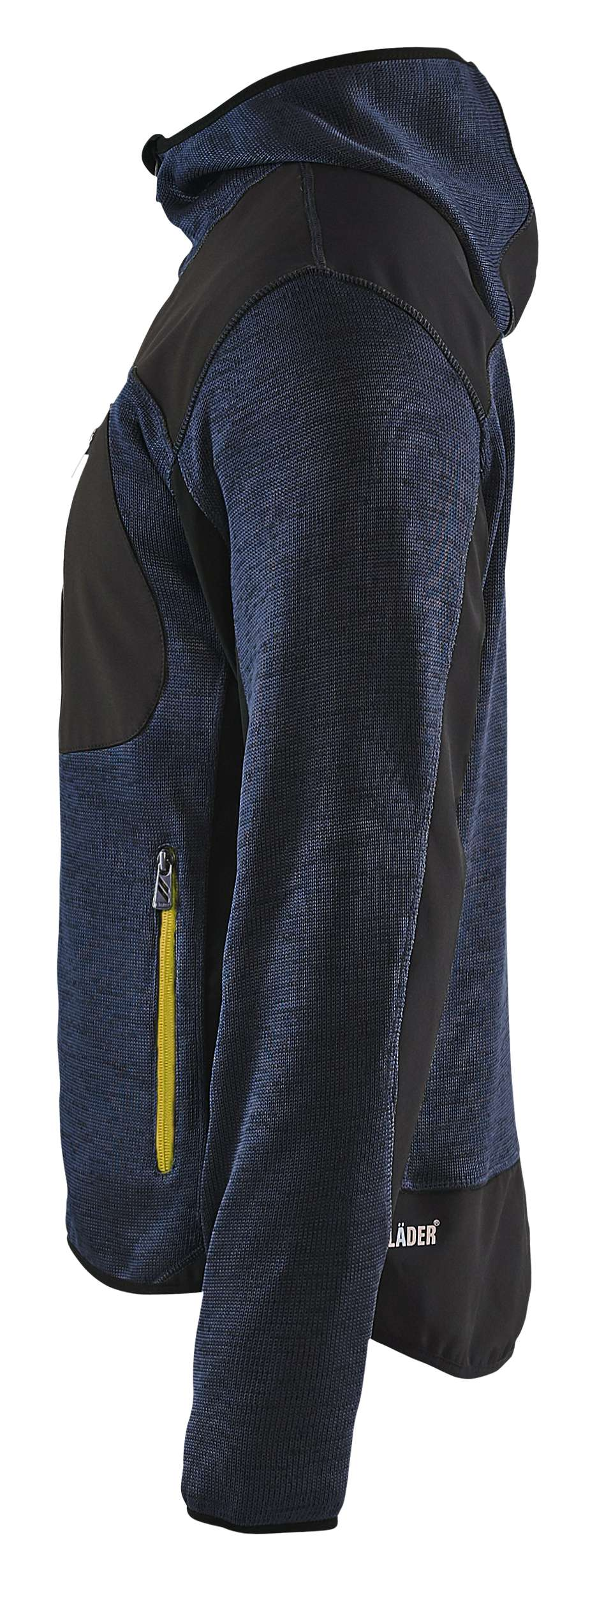 Blaklader Vesten 49302117 donkerblauw-geel(8635)